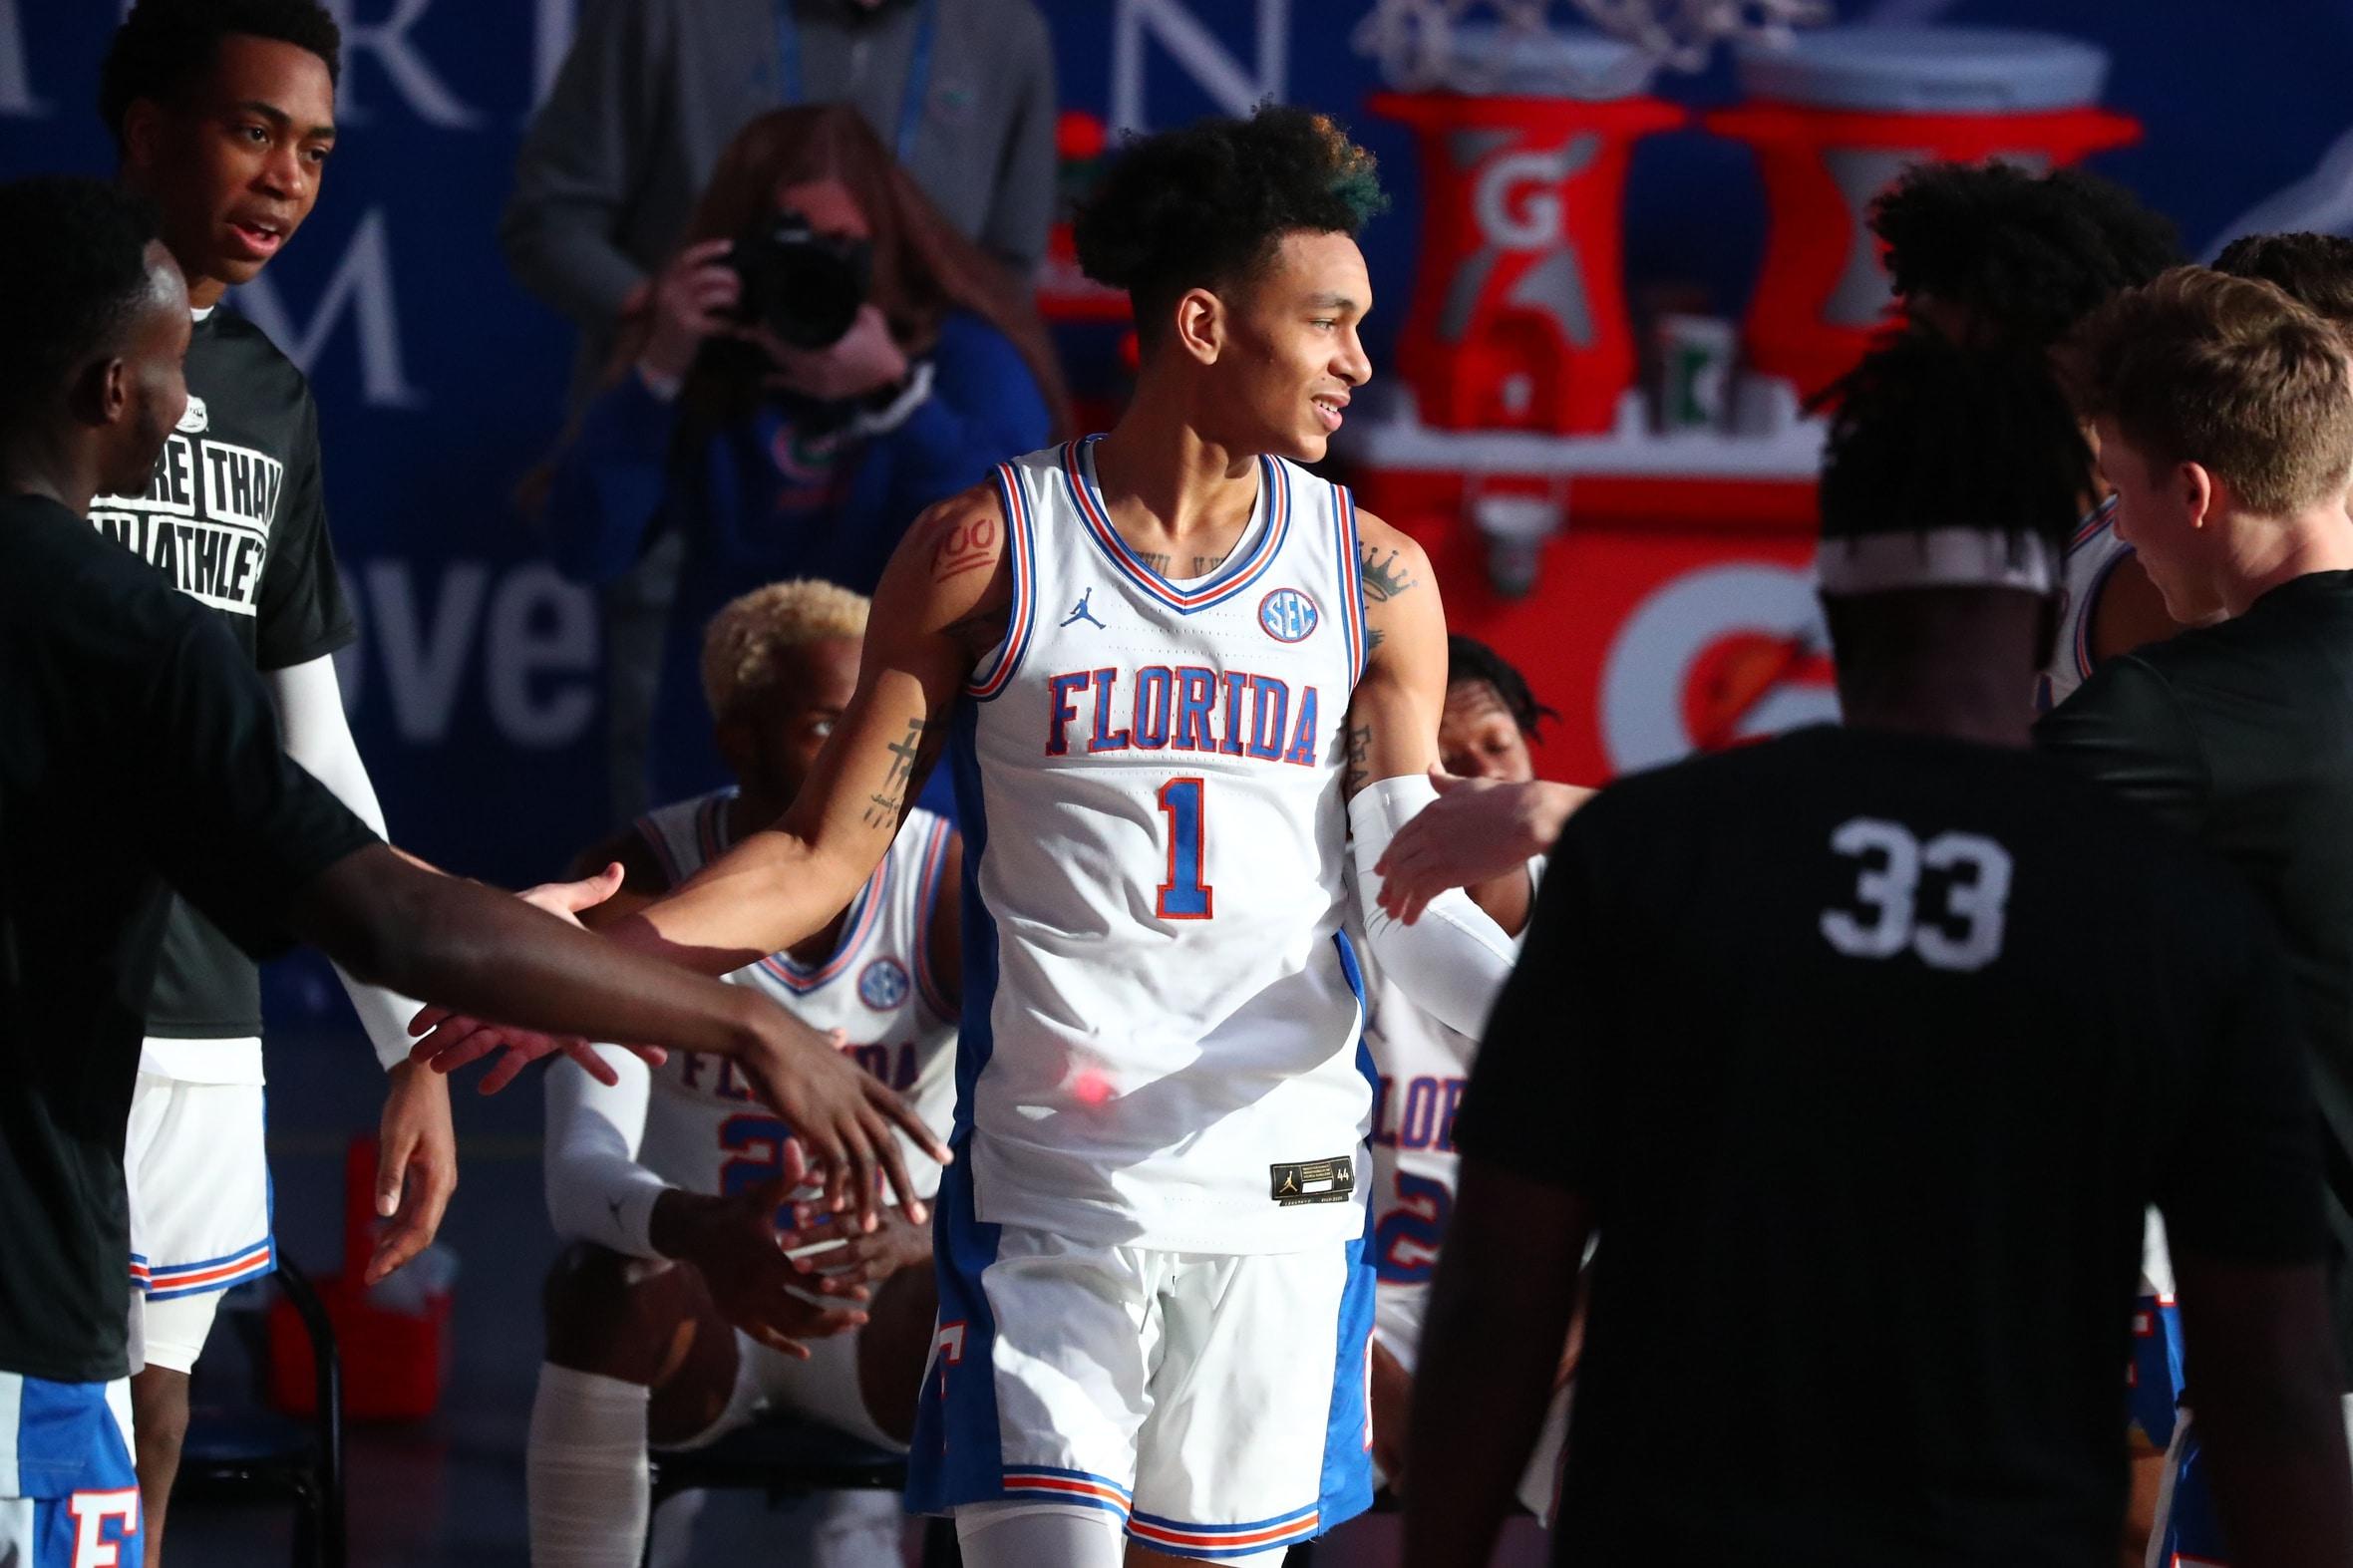 Florida guard Tre Mann declares for NBA Draft